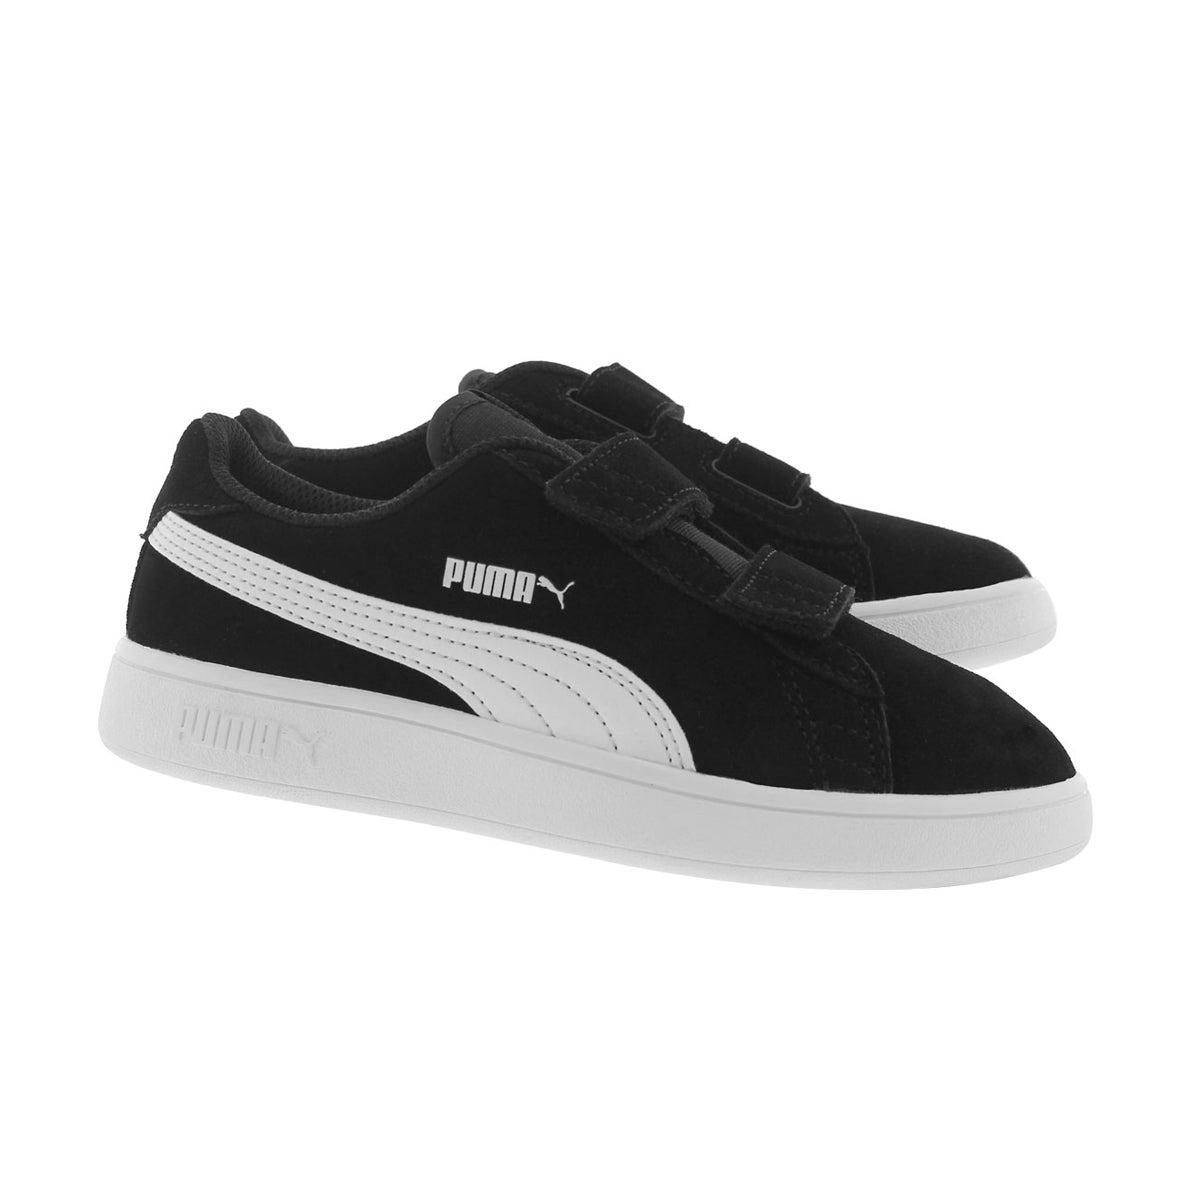 Bys Puma Smash v2 black sneaker